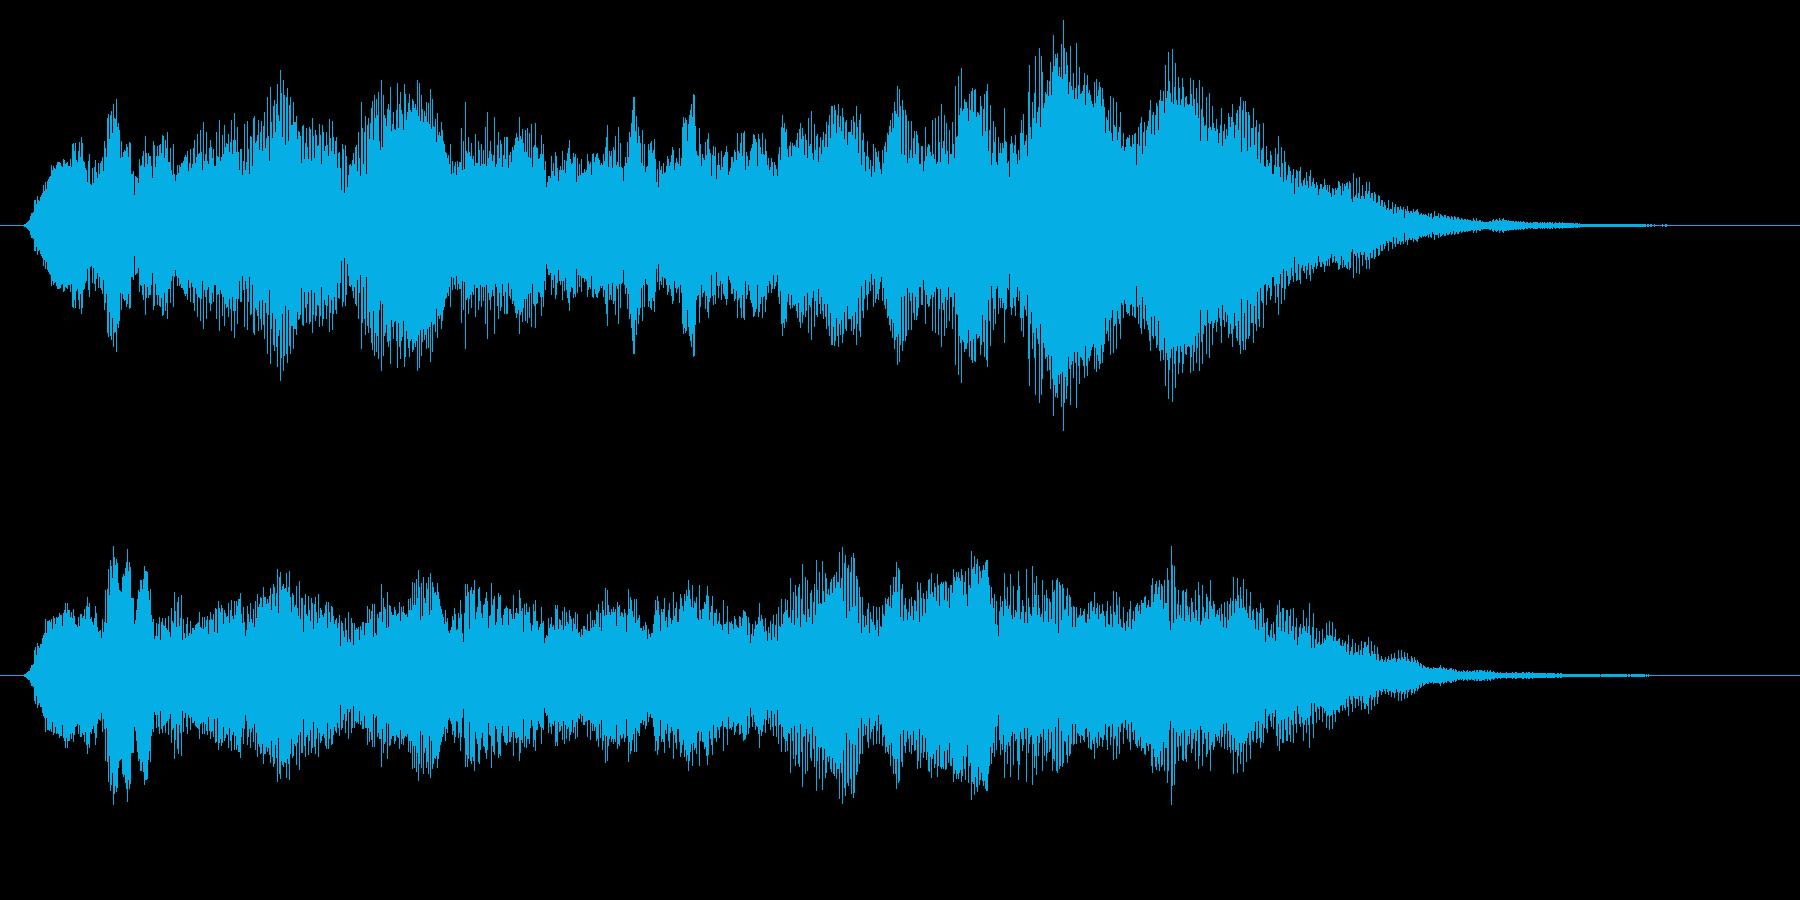 RPG_宿に一泊5の再生済みの波形